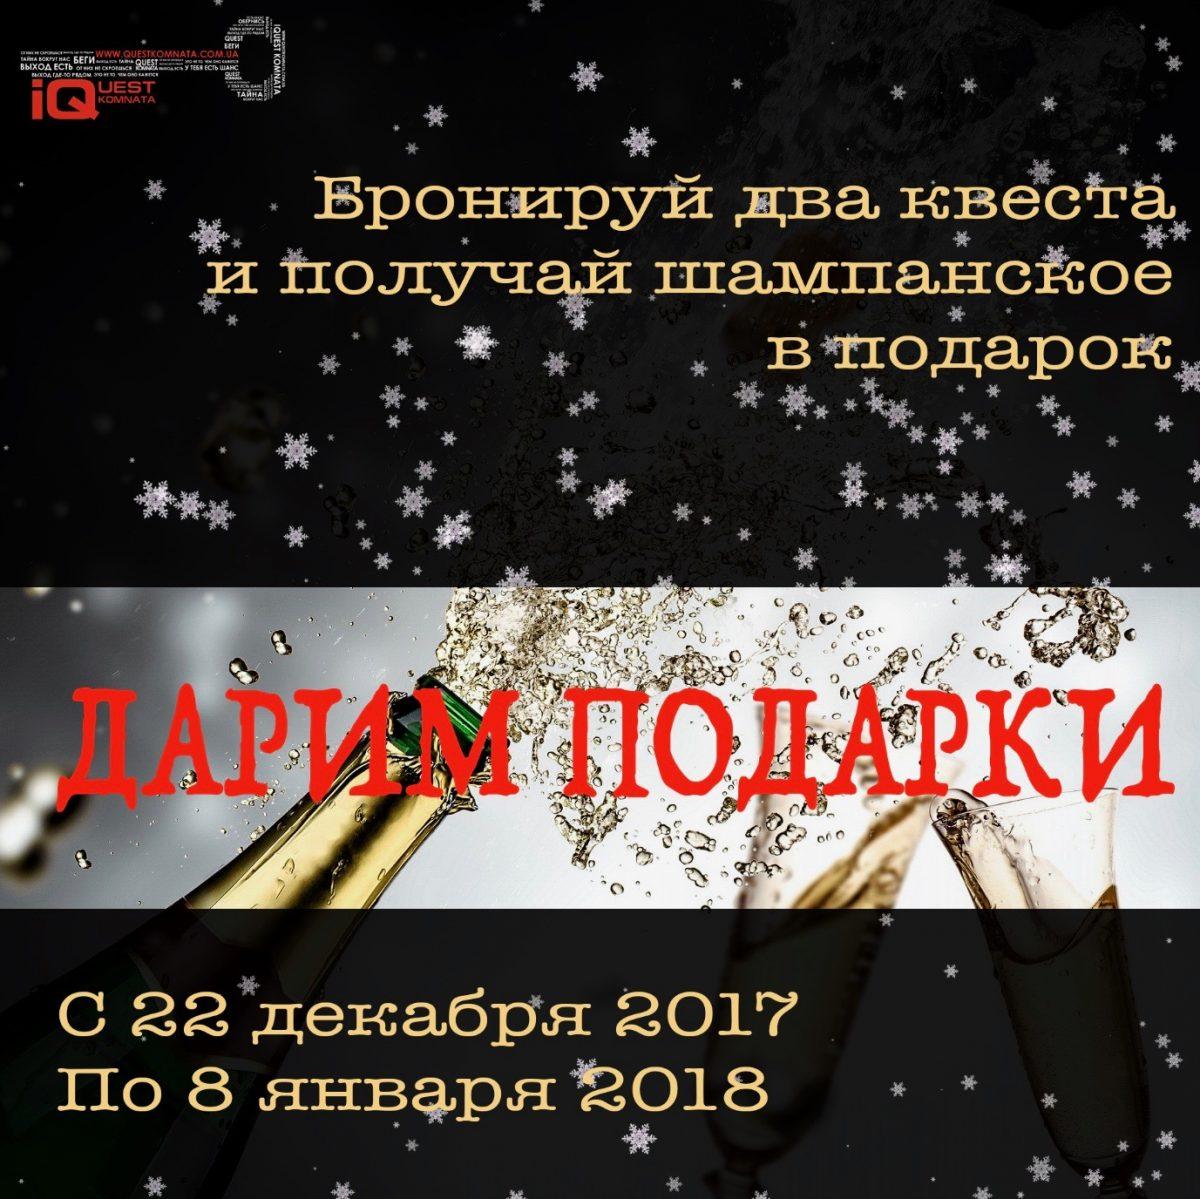 Новогодние праздники с IQuestkomnata!